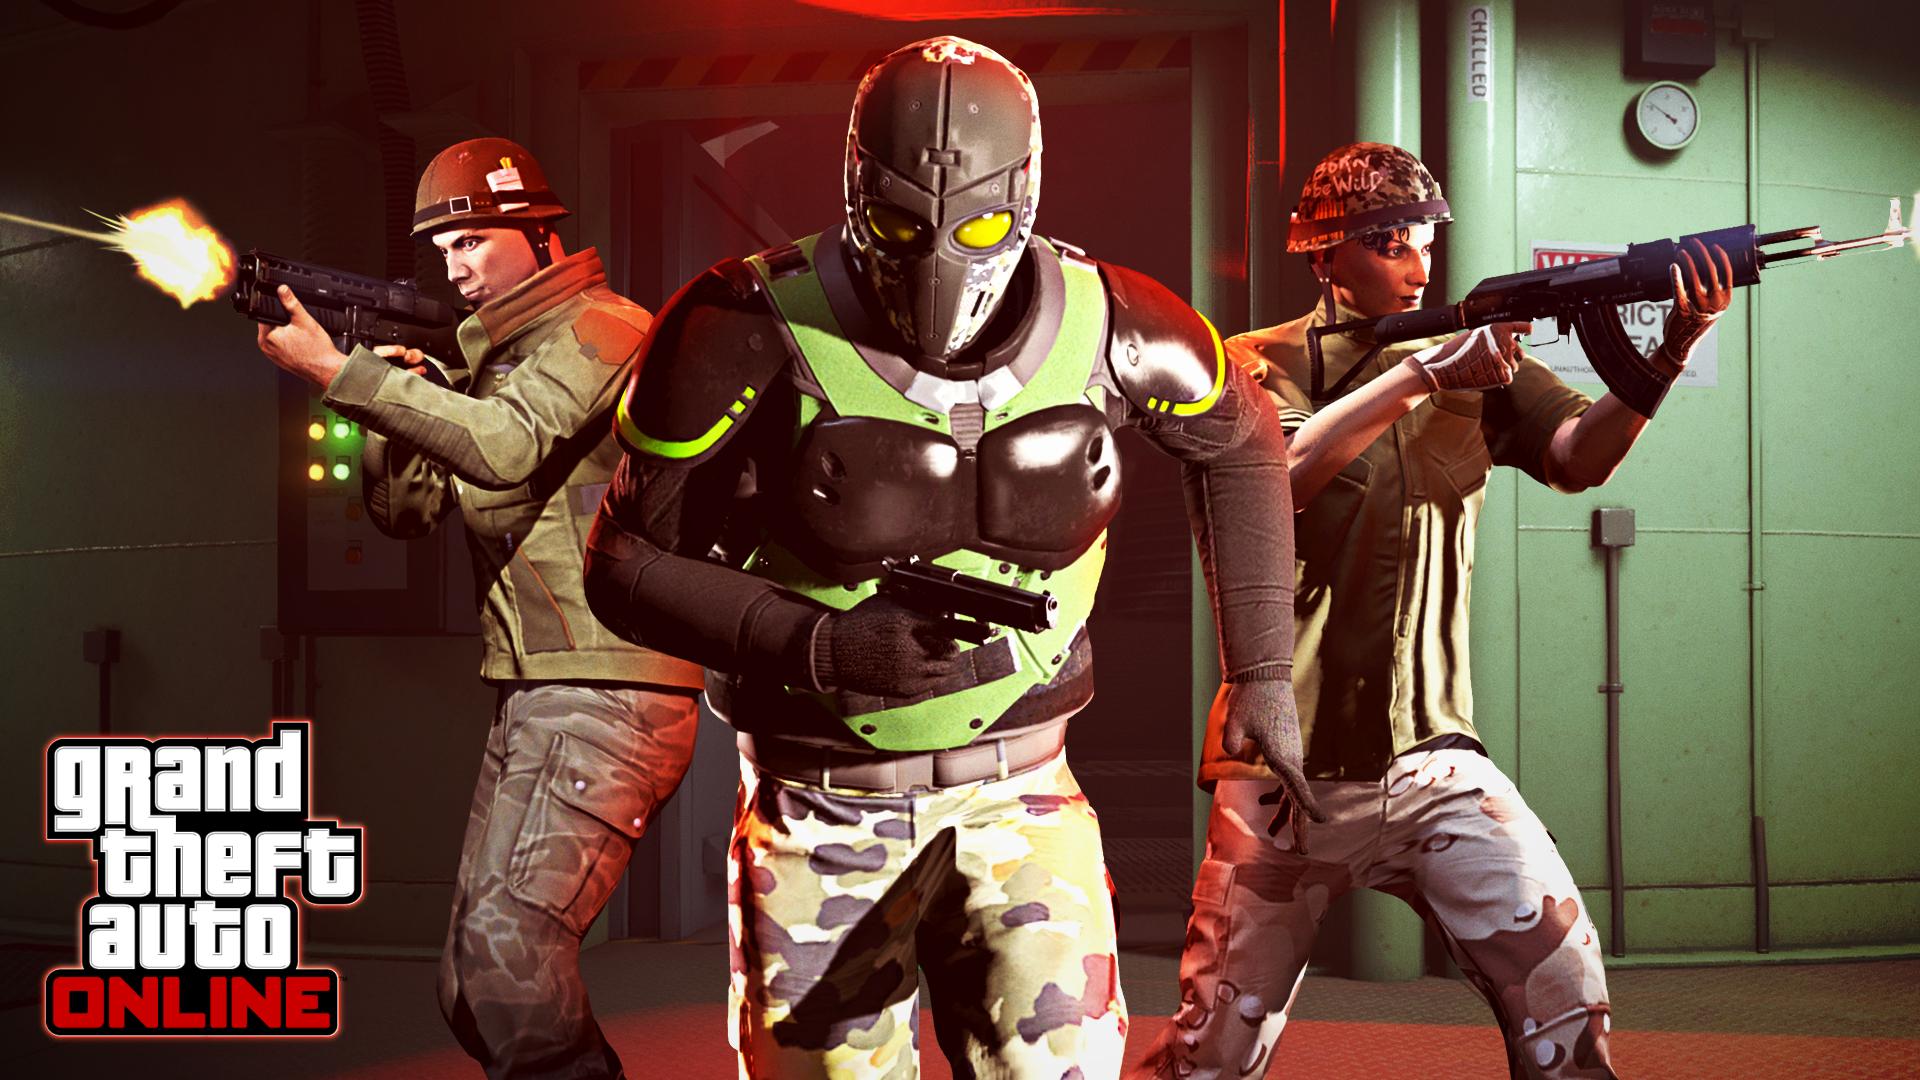 Nuevo MISILLE BASE SERIES en GTA Online esta semana + $250k